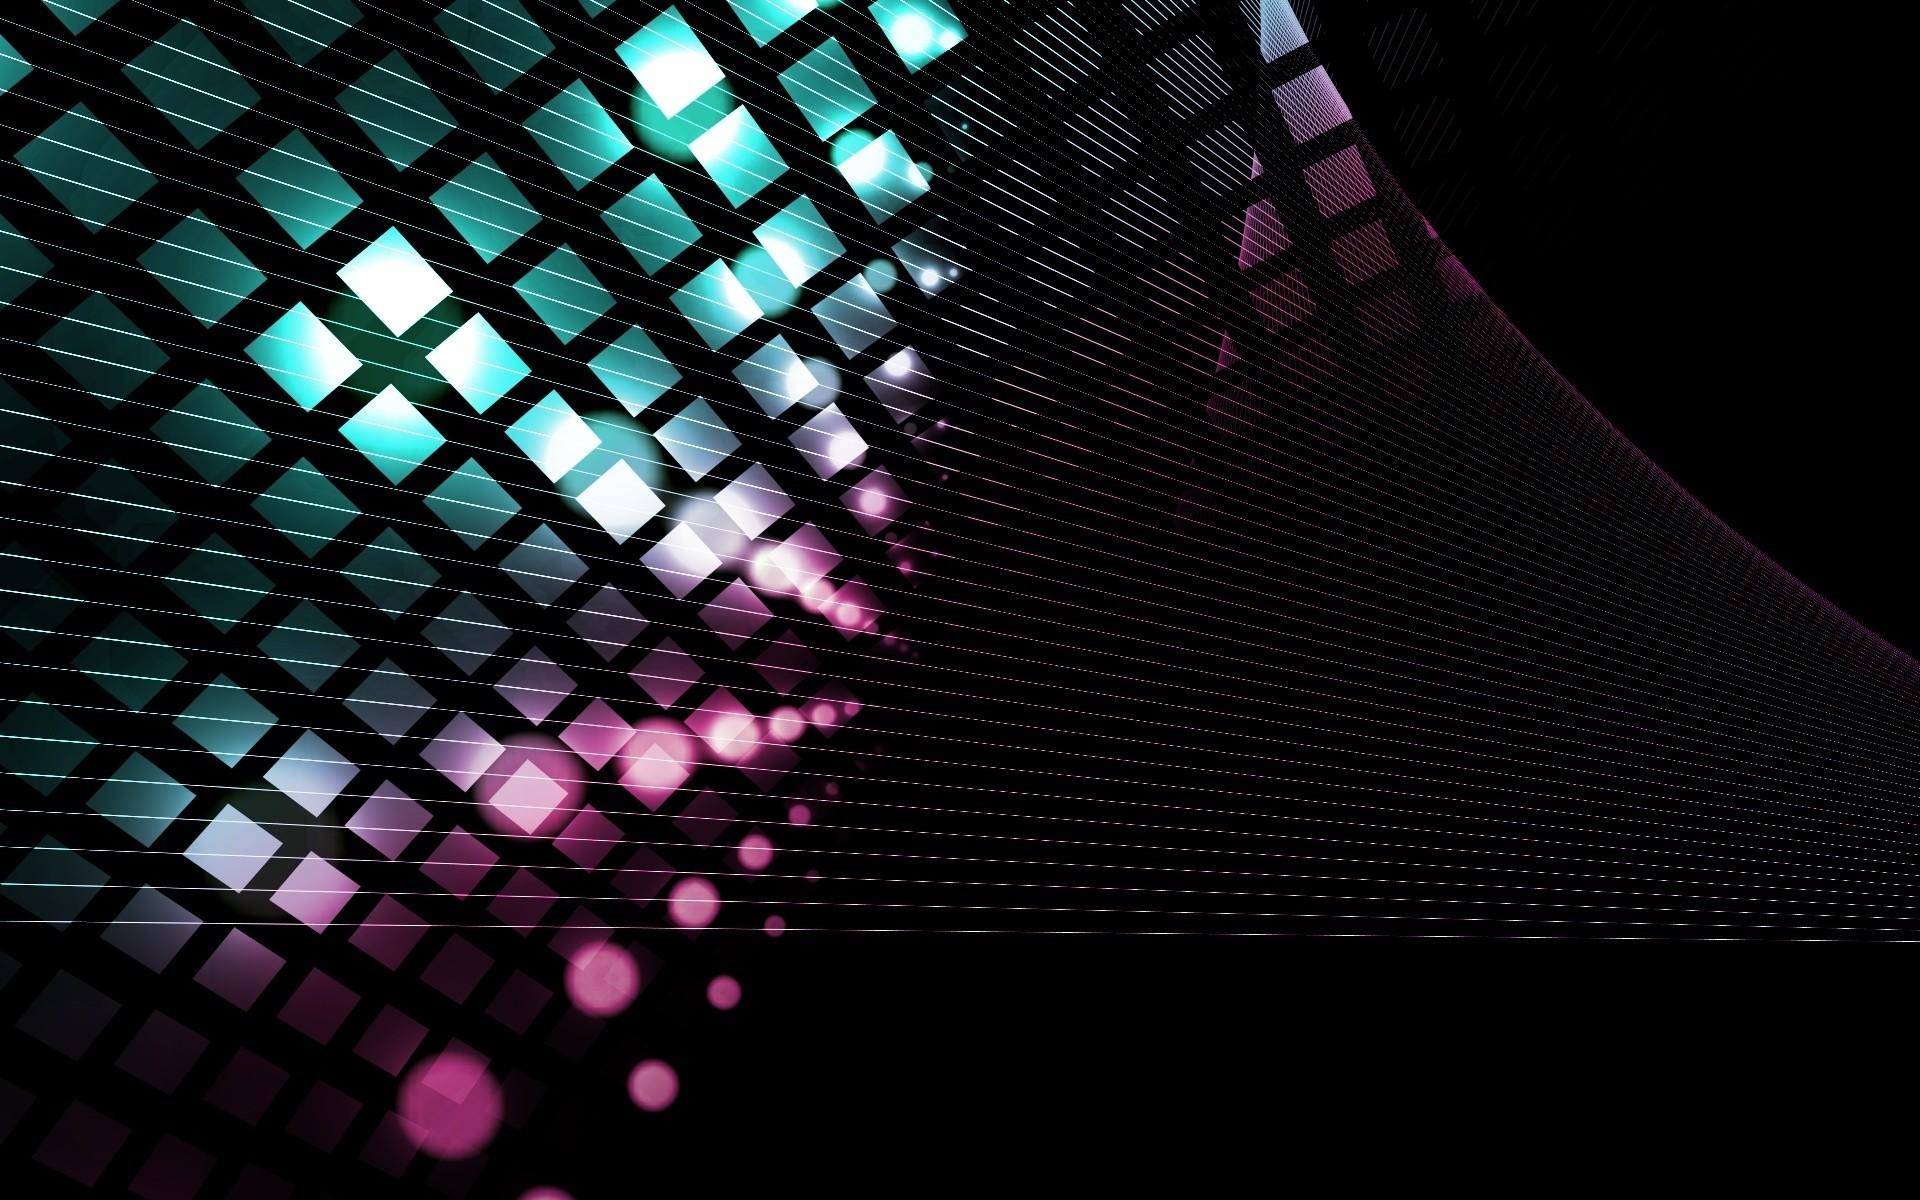 Dark Pink Wallpaper 4 Hd Wallpaper